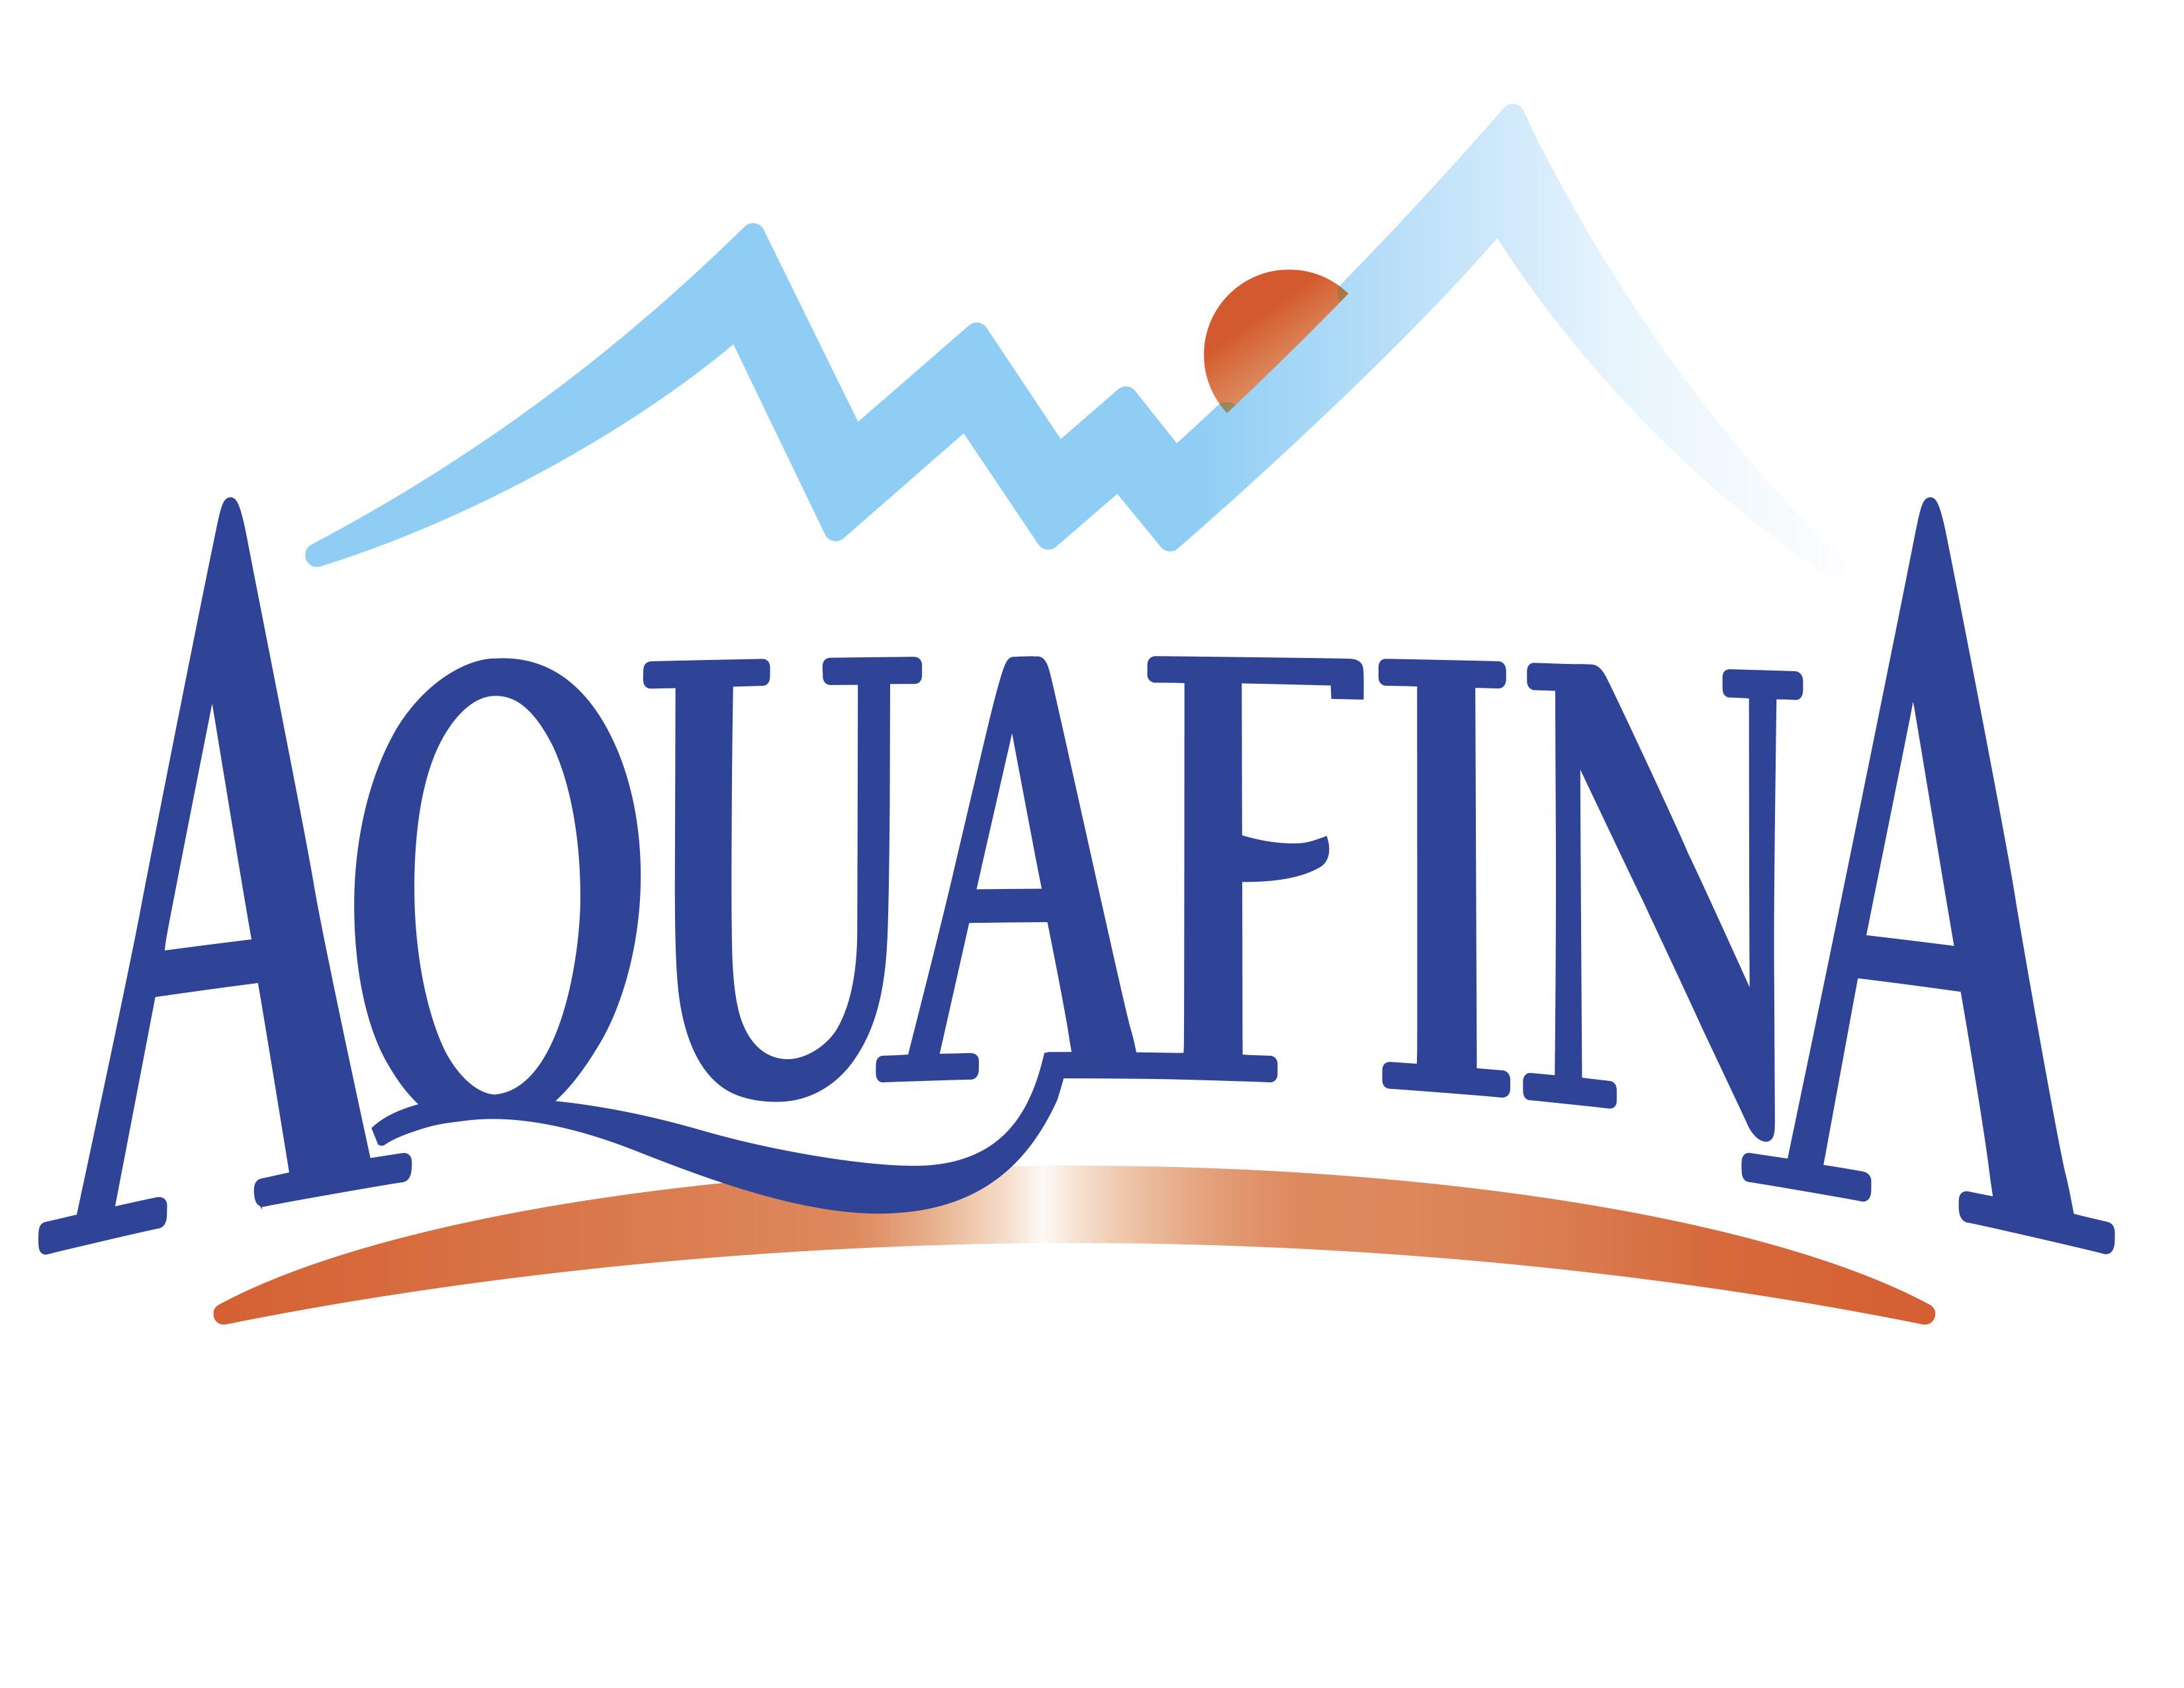 Logo Aquafina Png - Logo_Aquafina_2016.jpg, Transparent background PNG HD thumbnail